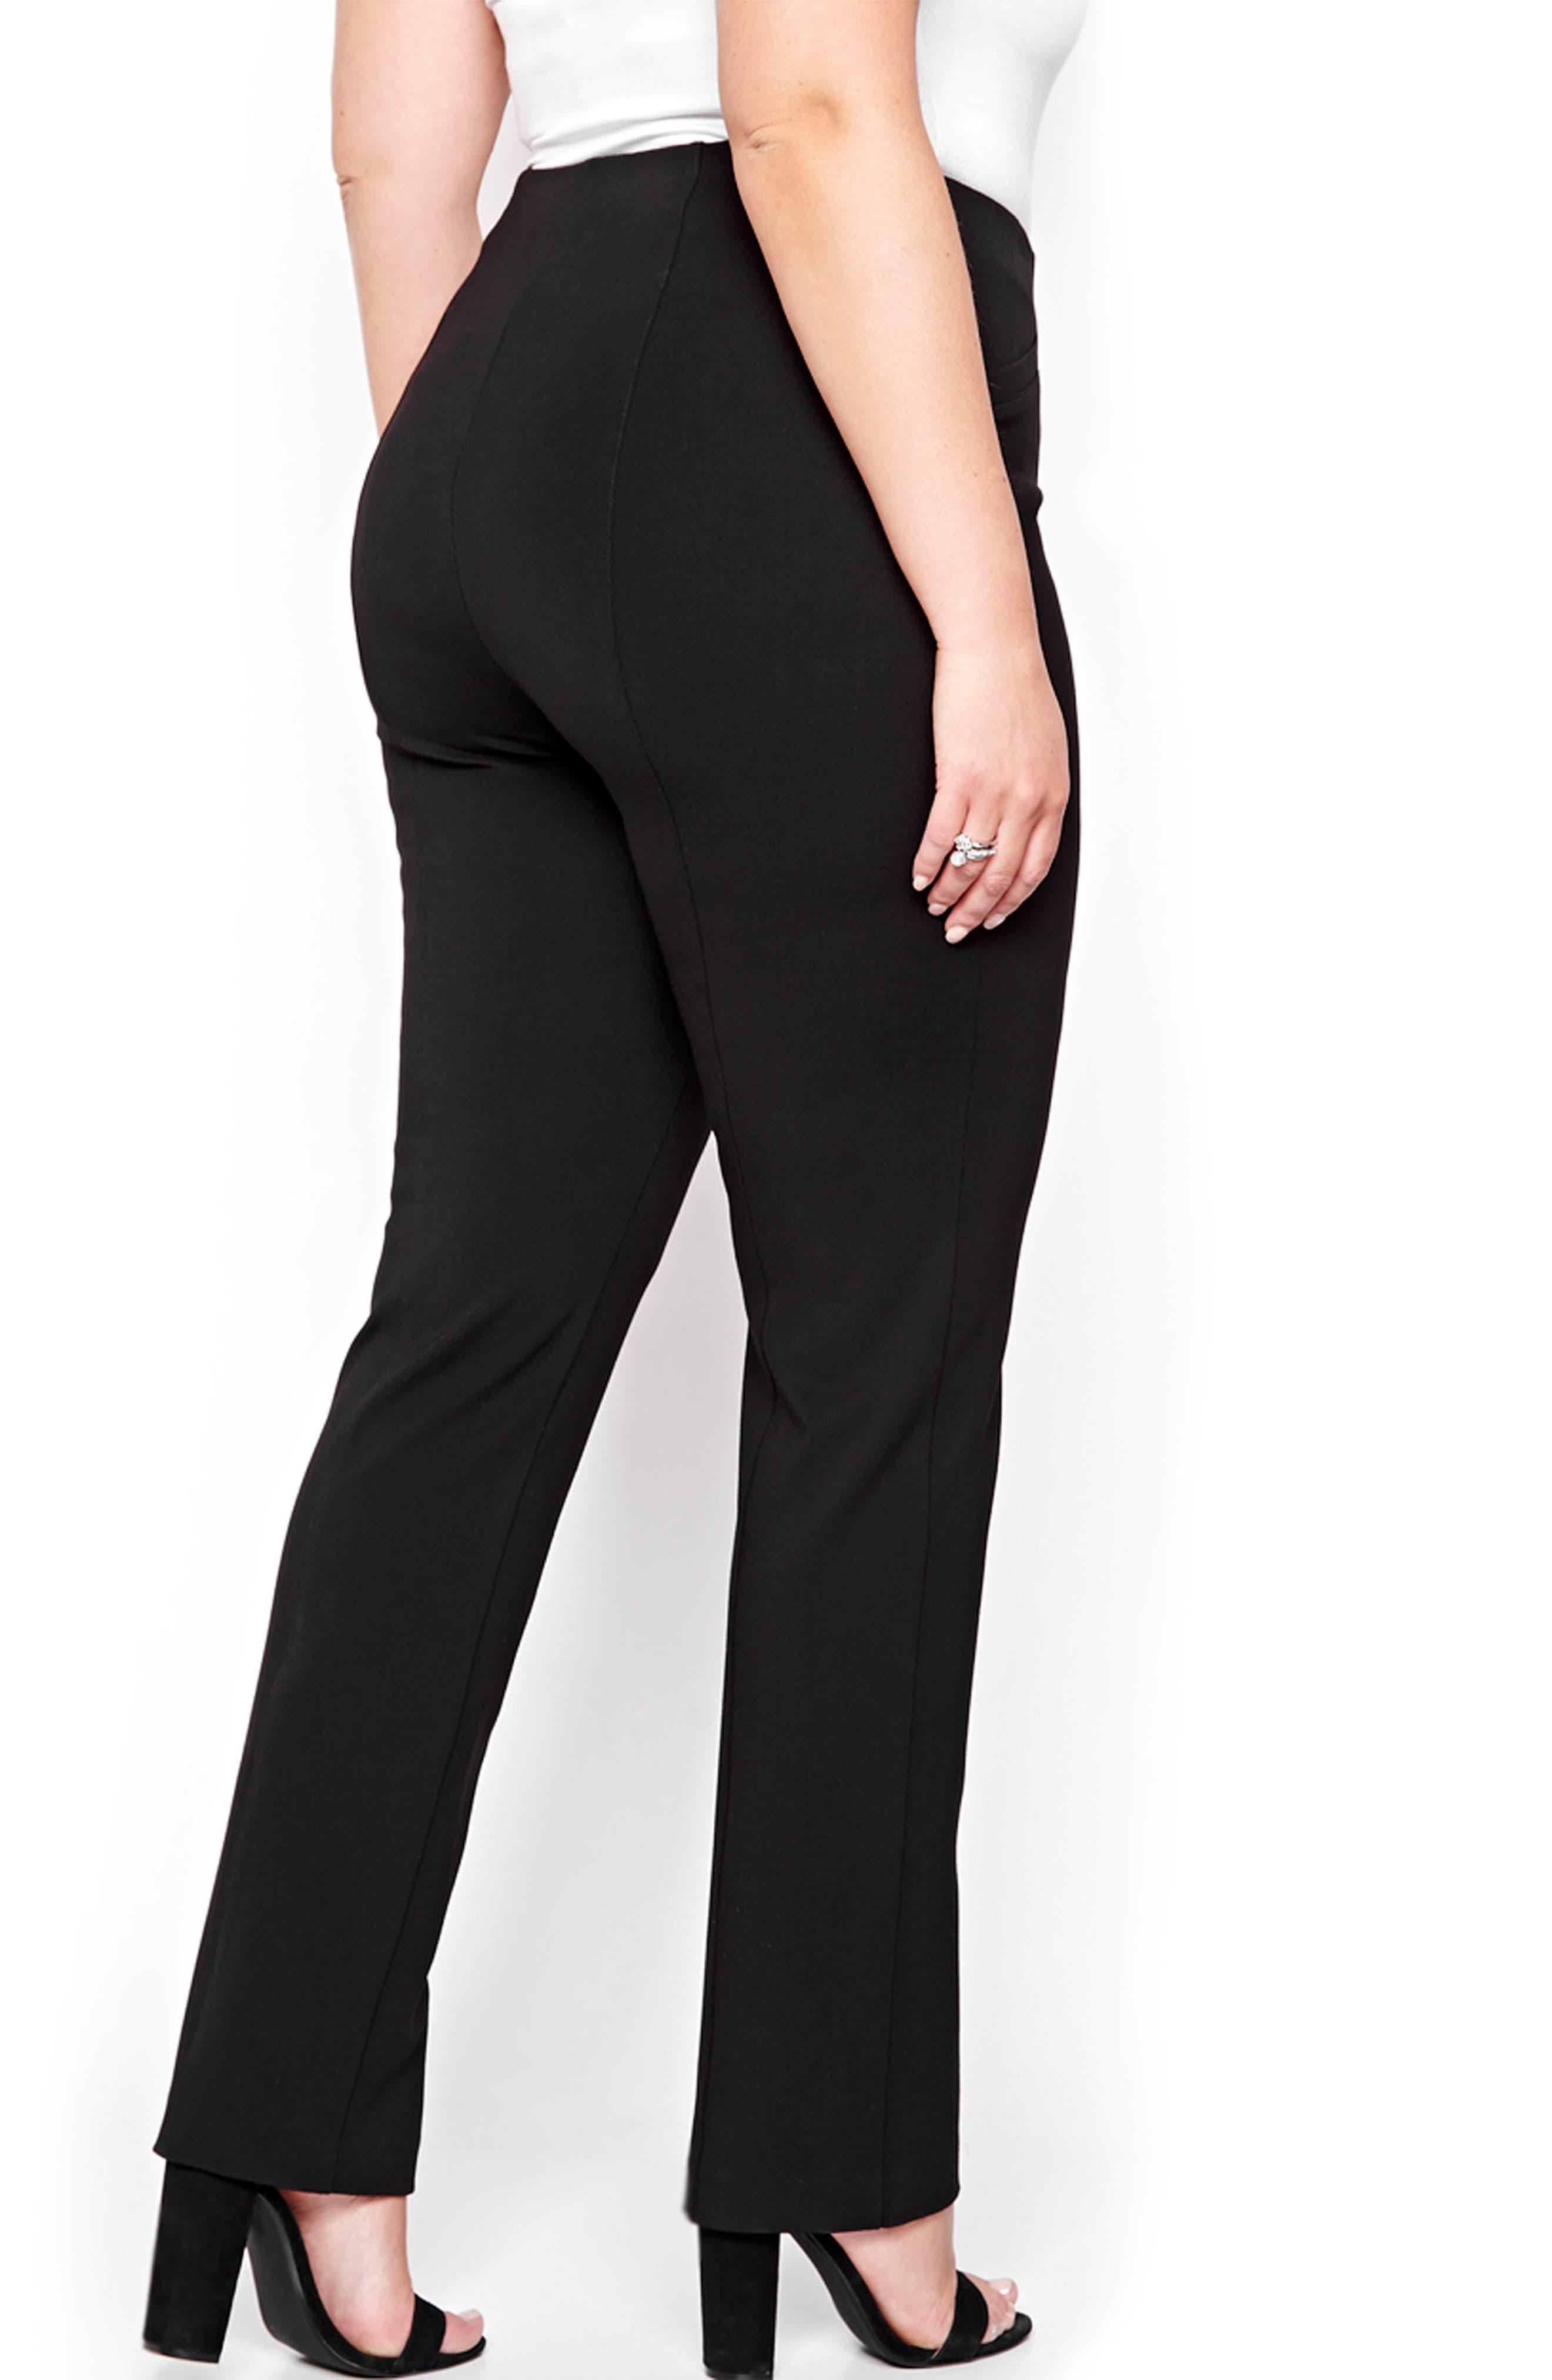 Taylor Straight Leg Ponte Pants,                             Alternate thumbnail 2, color,                             001